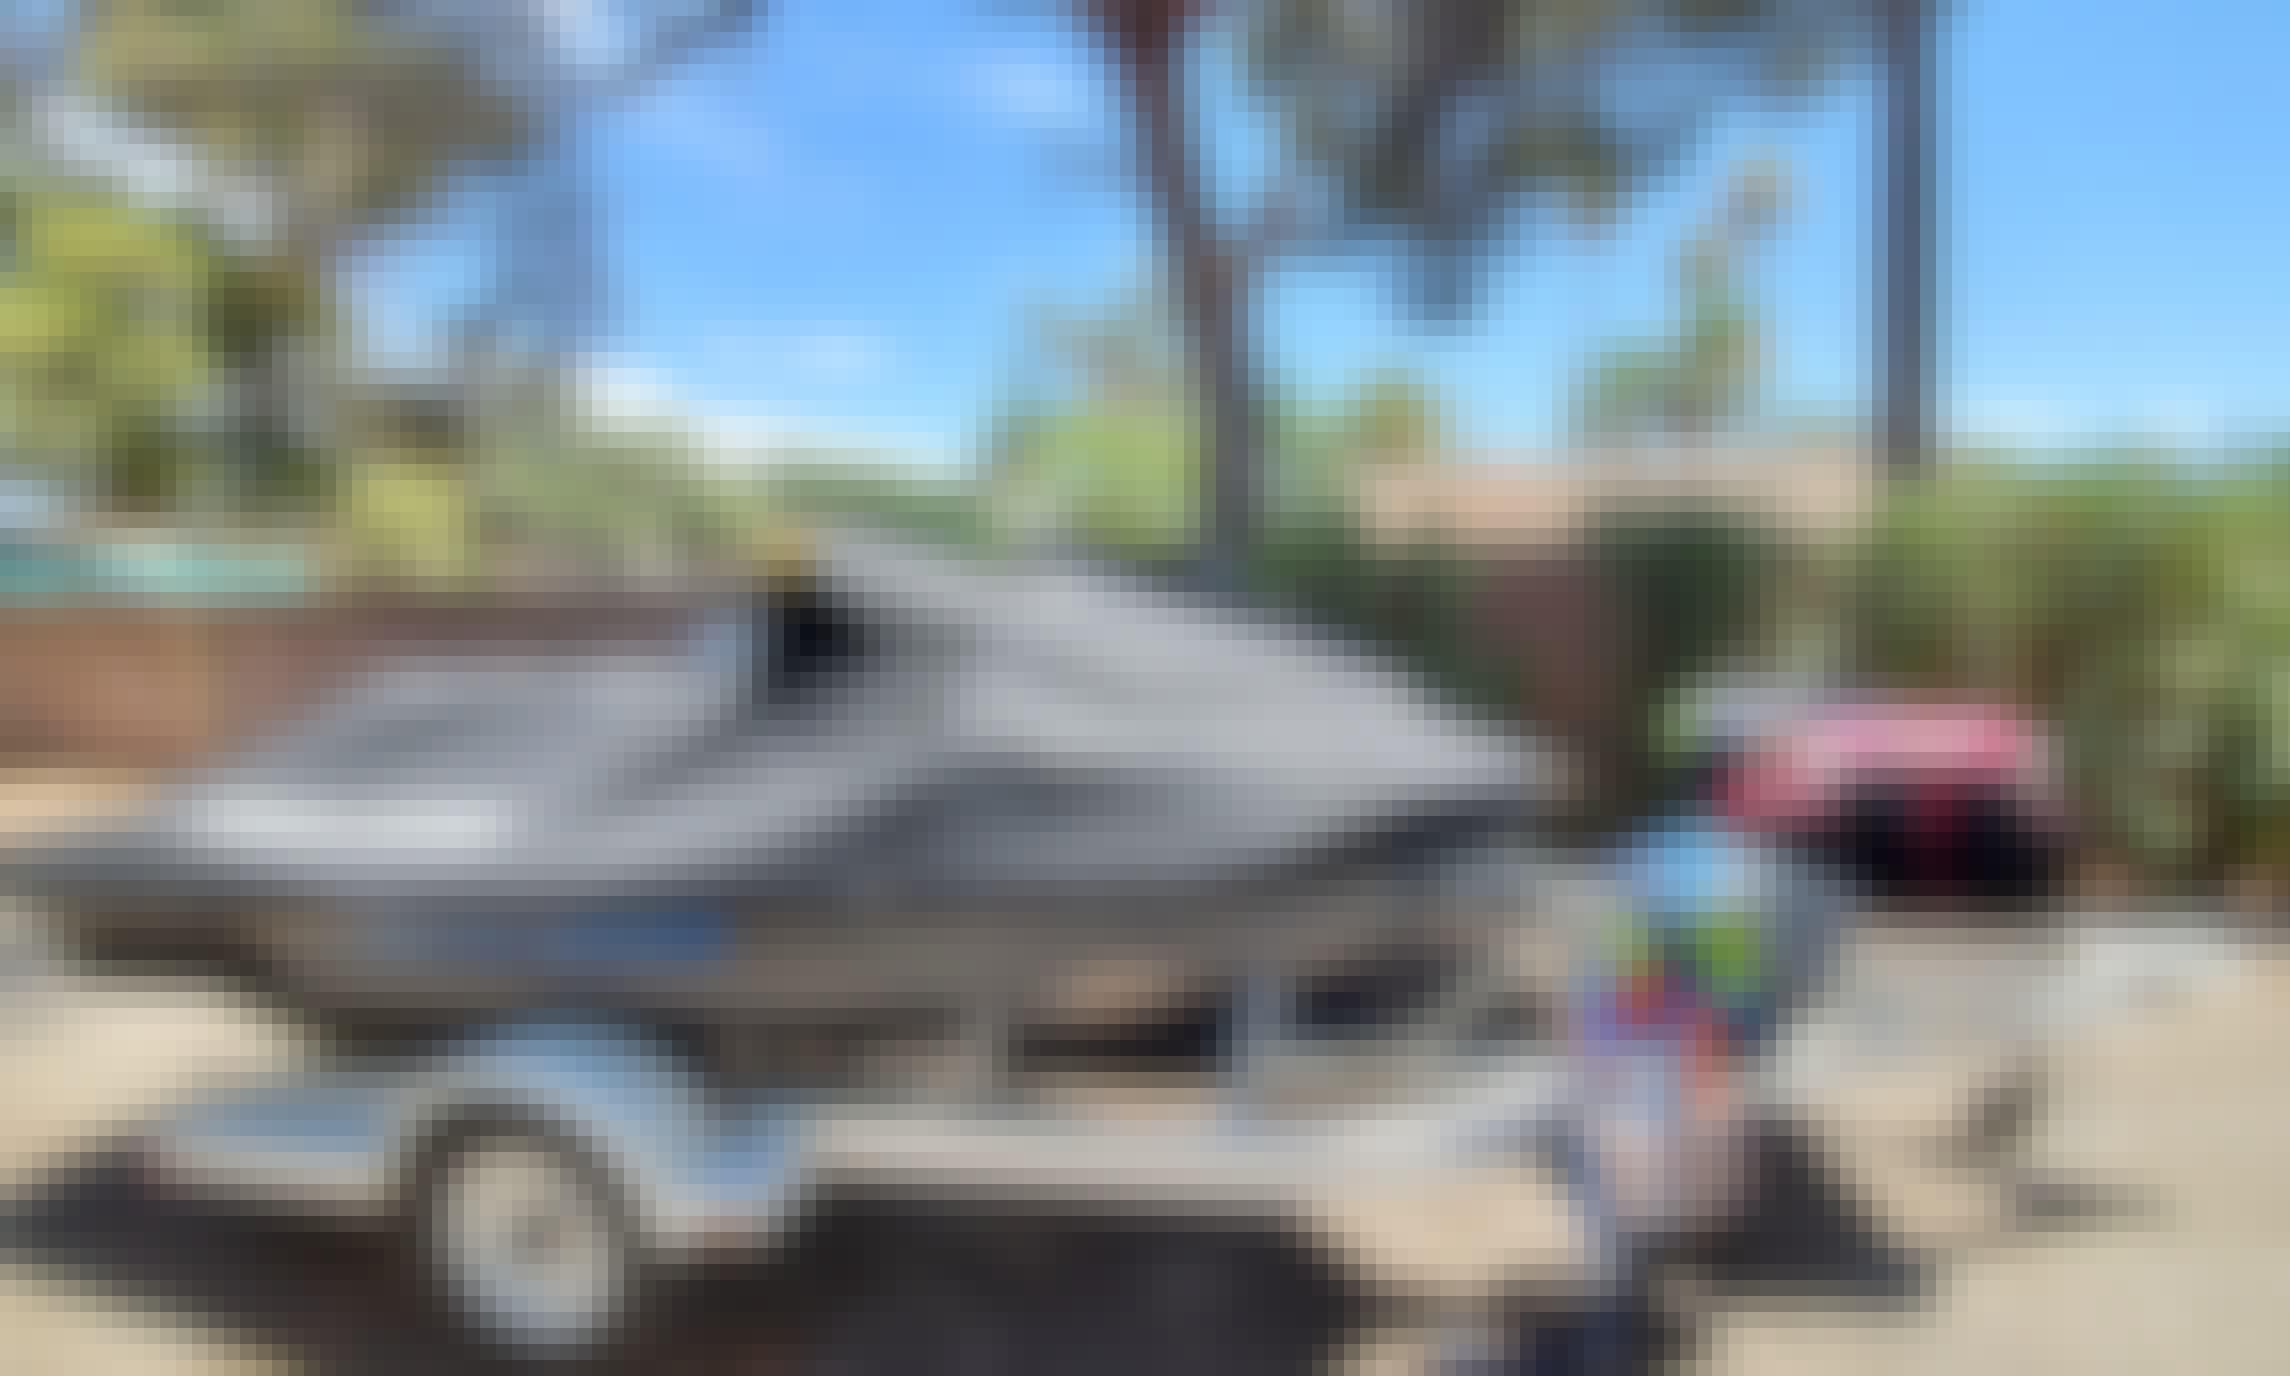 From Las Vegas to Lake Mead w/ High Performance & Luxury! 2019 Sea-Doo GTX